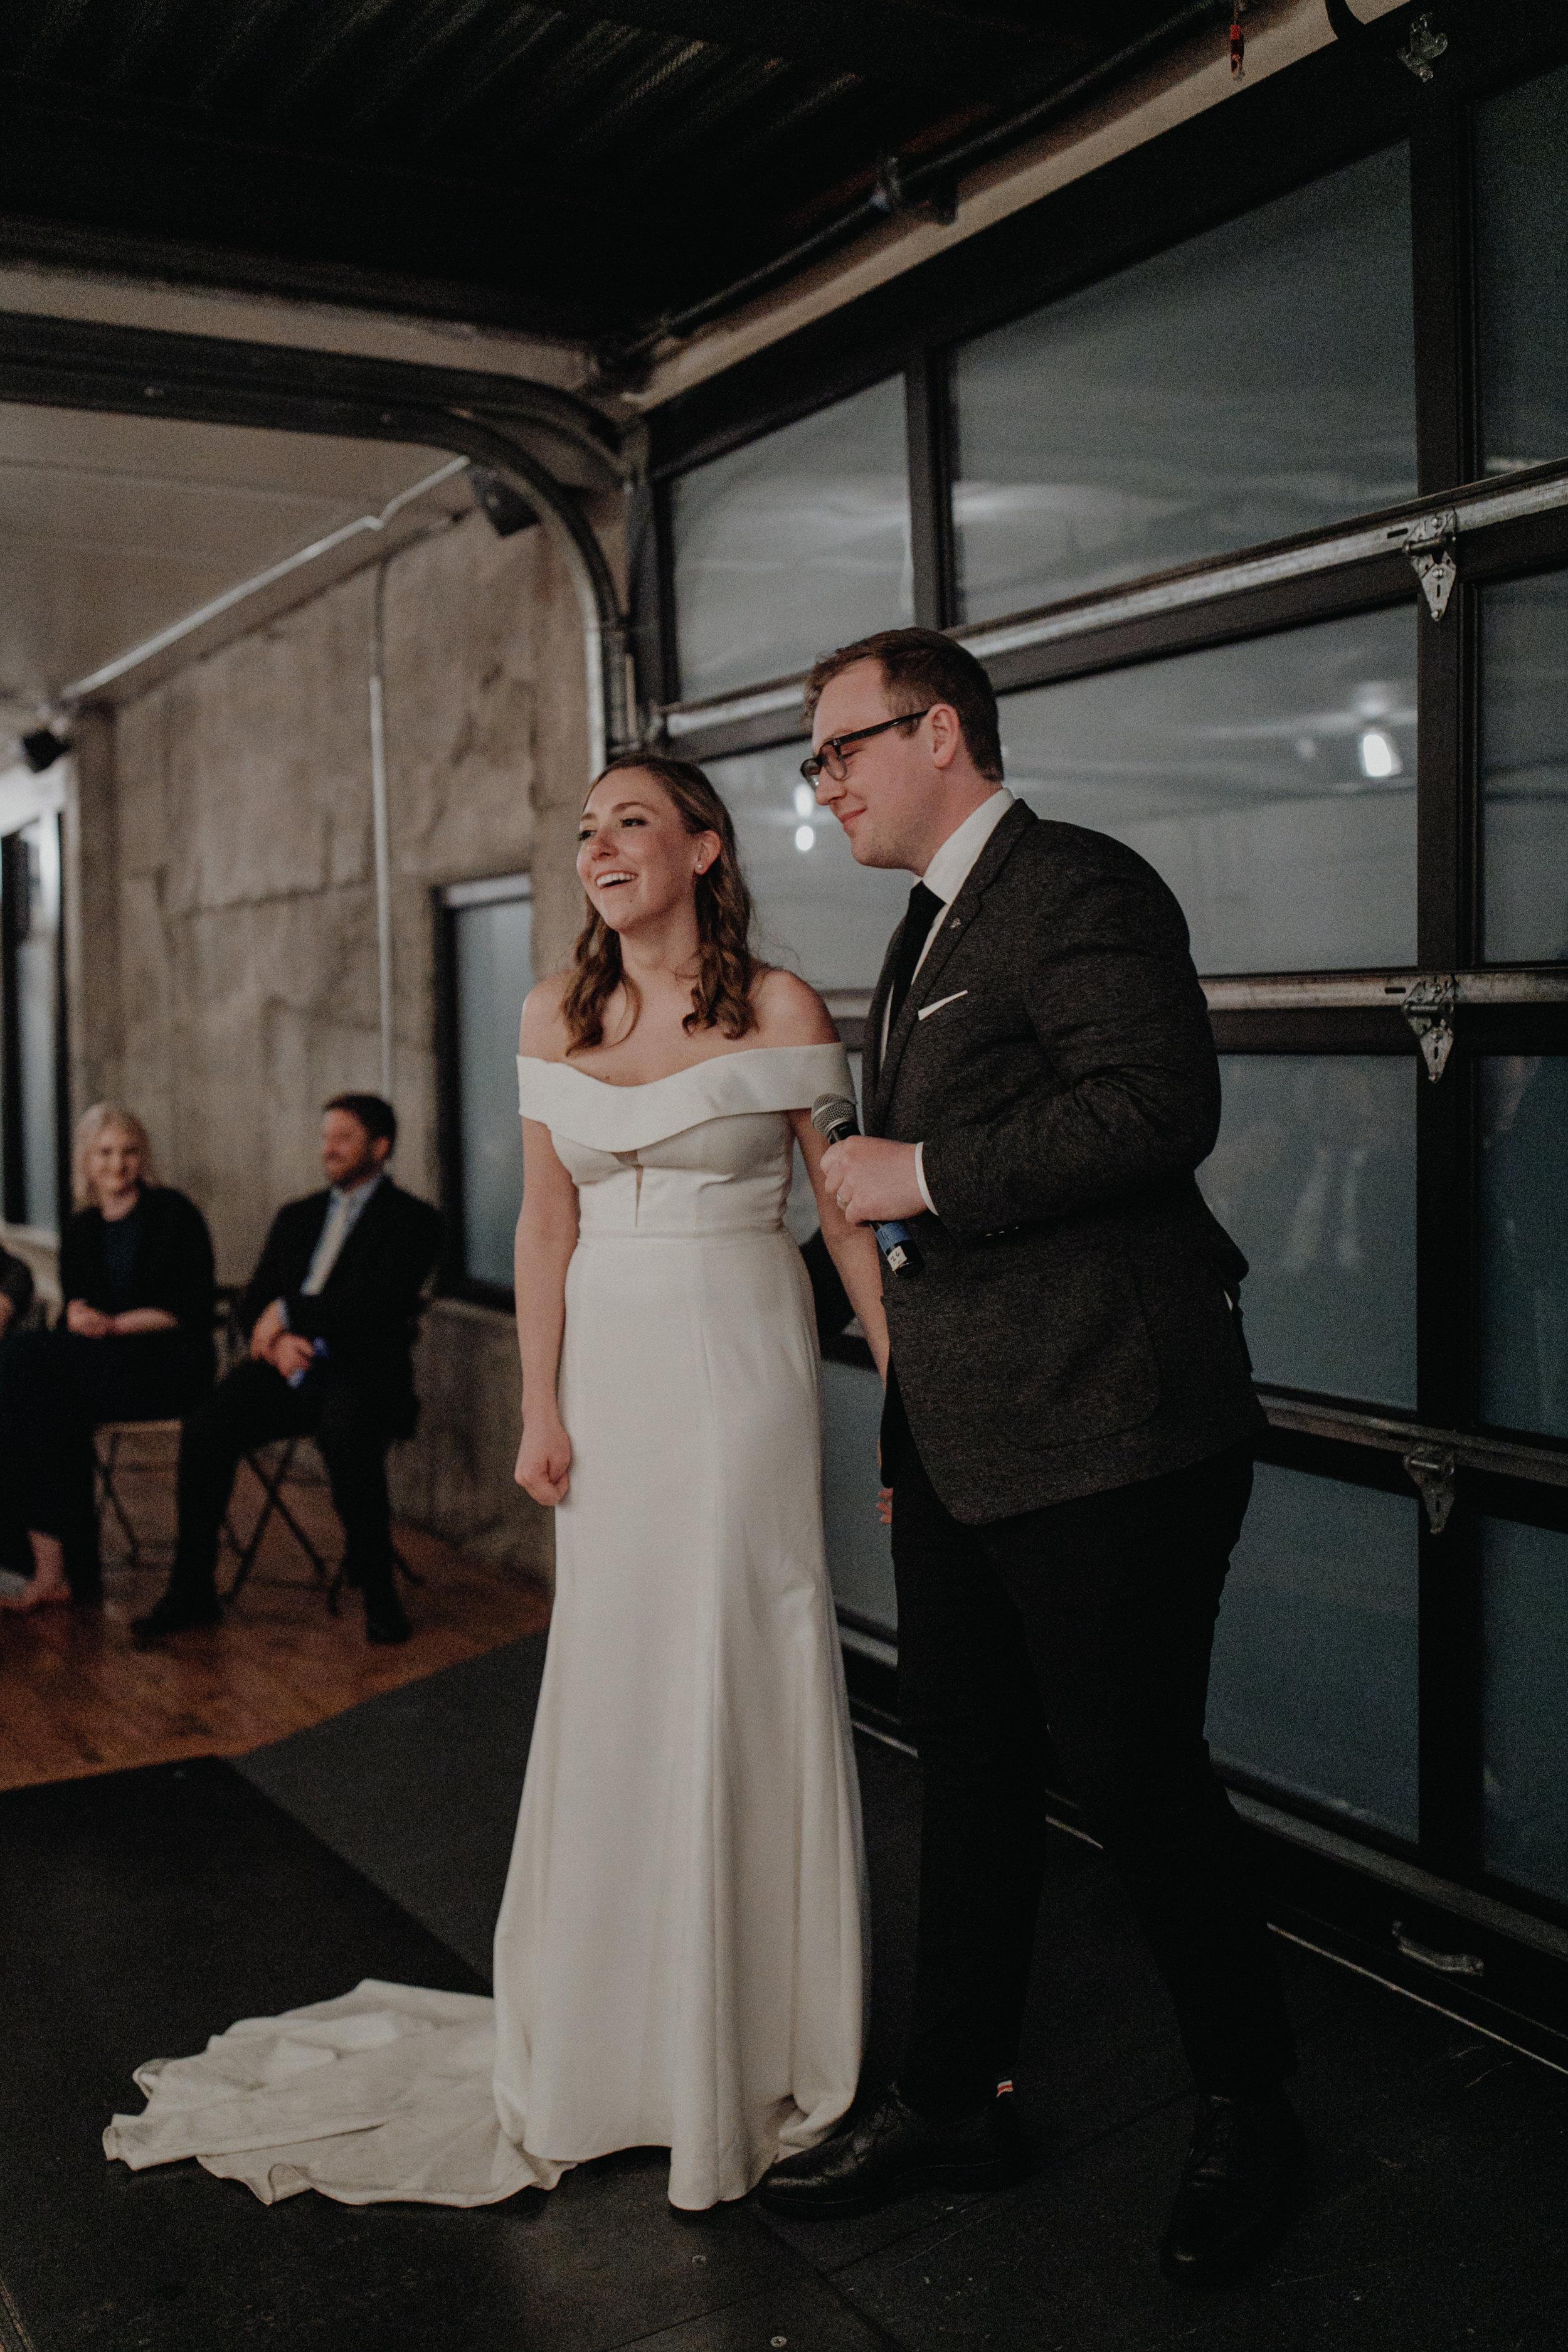 fremont_foundry_seattle_wedding_oliviastrohm___-12.jpg